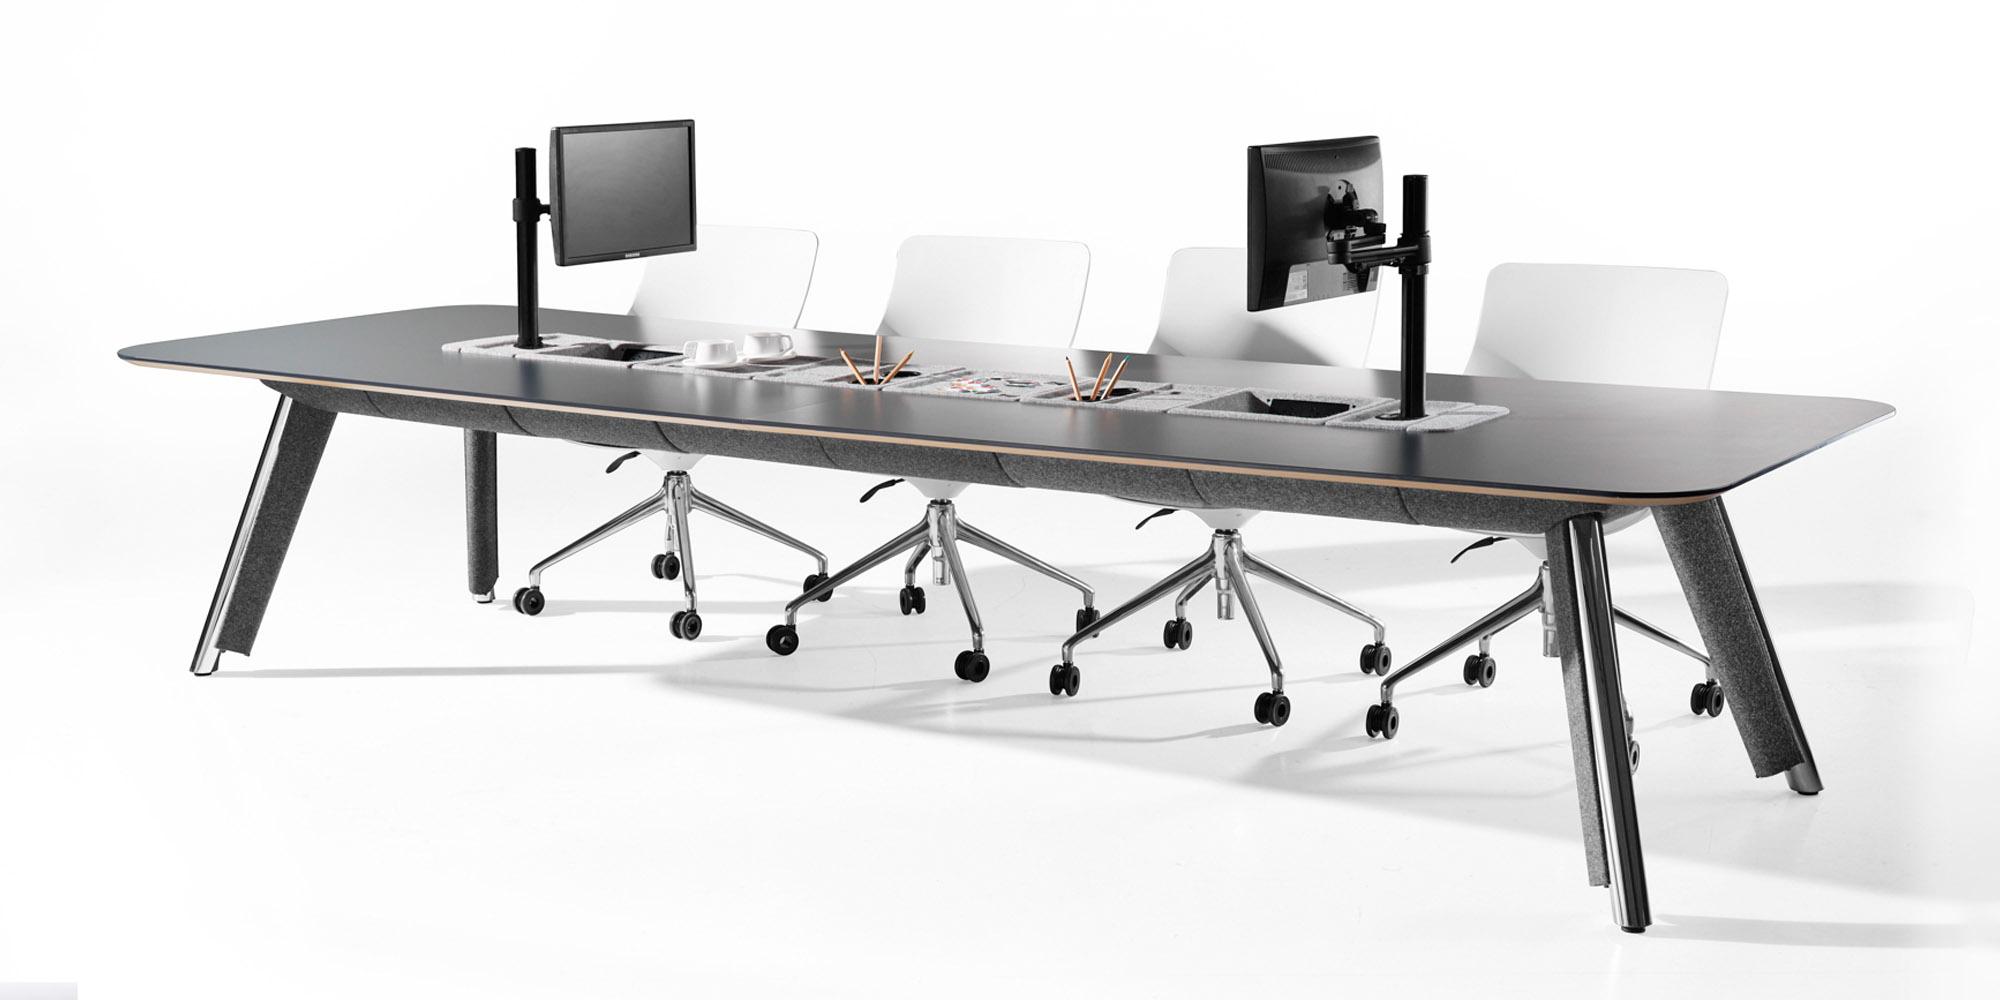 Jones-and-Partners-focus-office-furniture-design-8.jpg